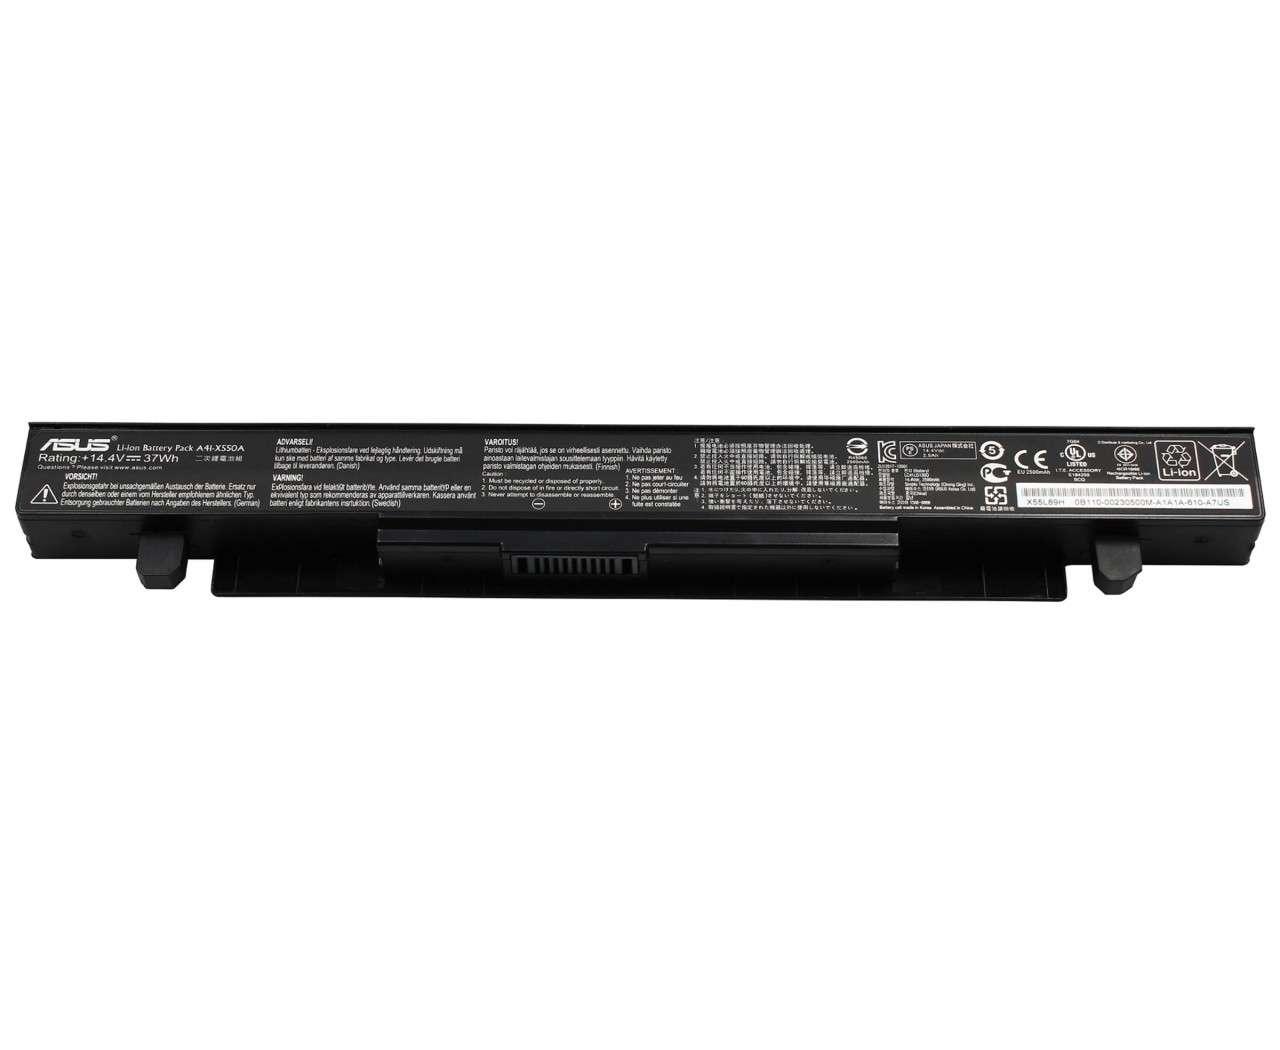 Baterie Asus F554LA Originala imagine powerlaptop.ro 2021